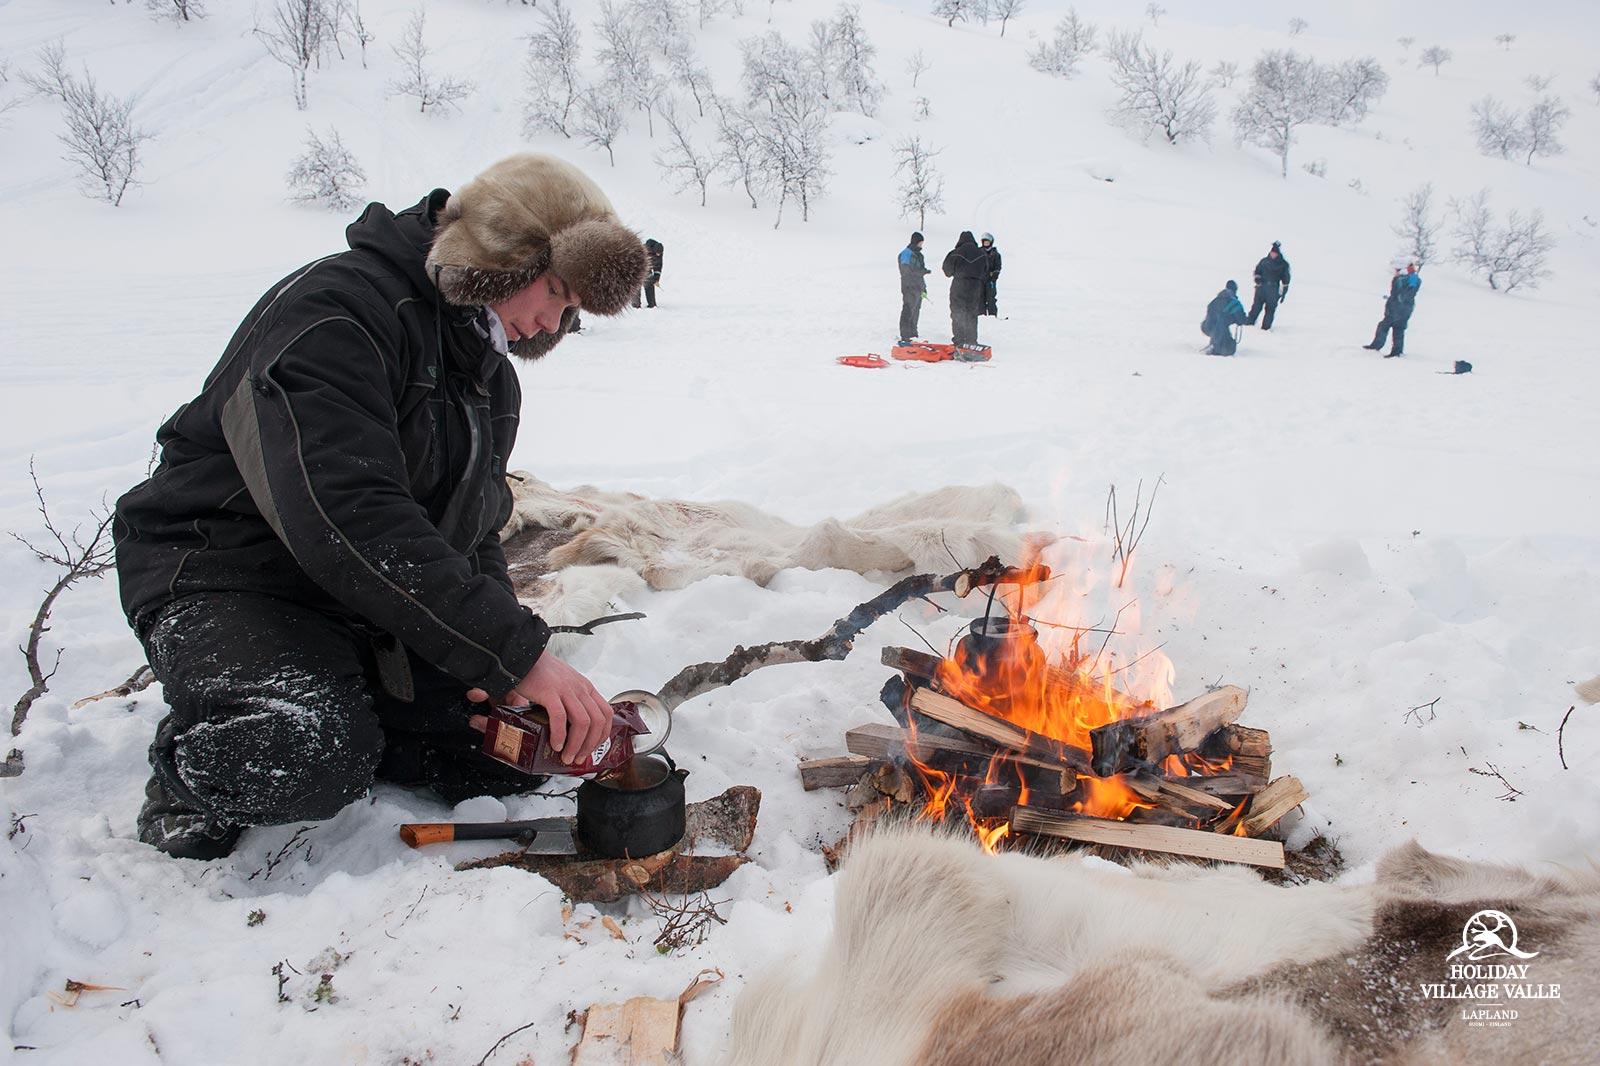 gallery-winter-adventure-holiday-village-valle-lapland-009